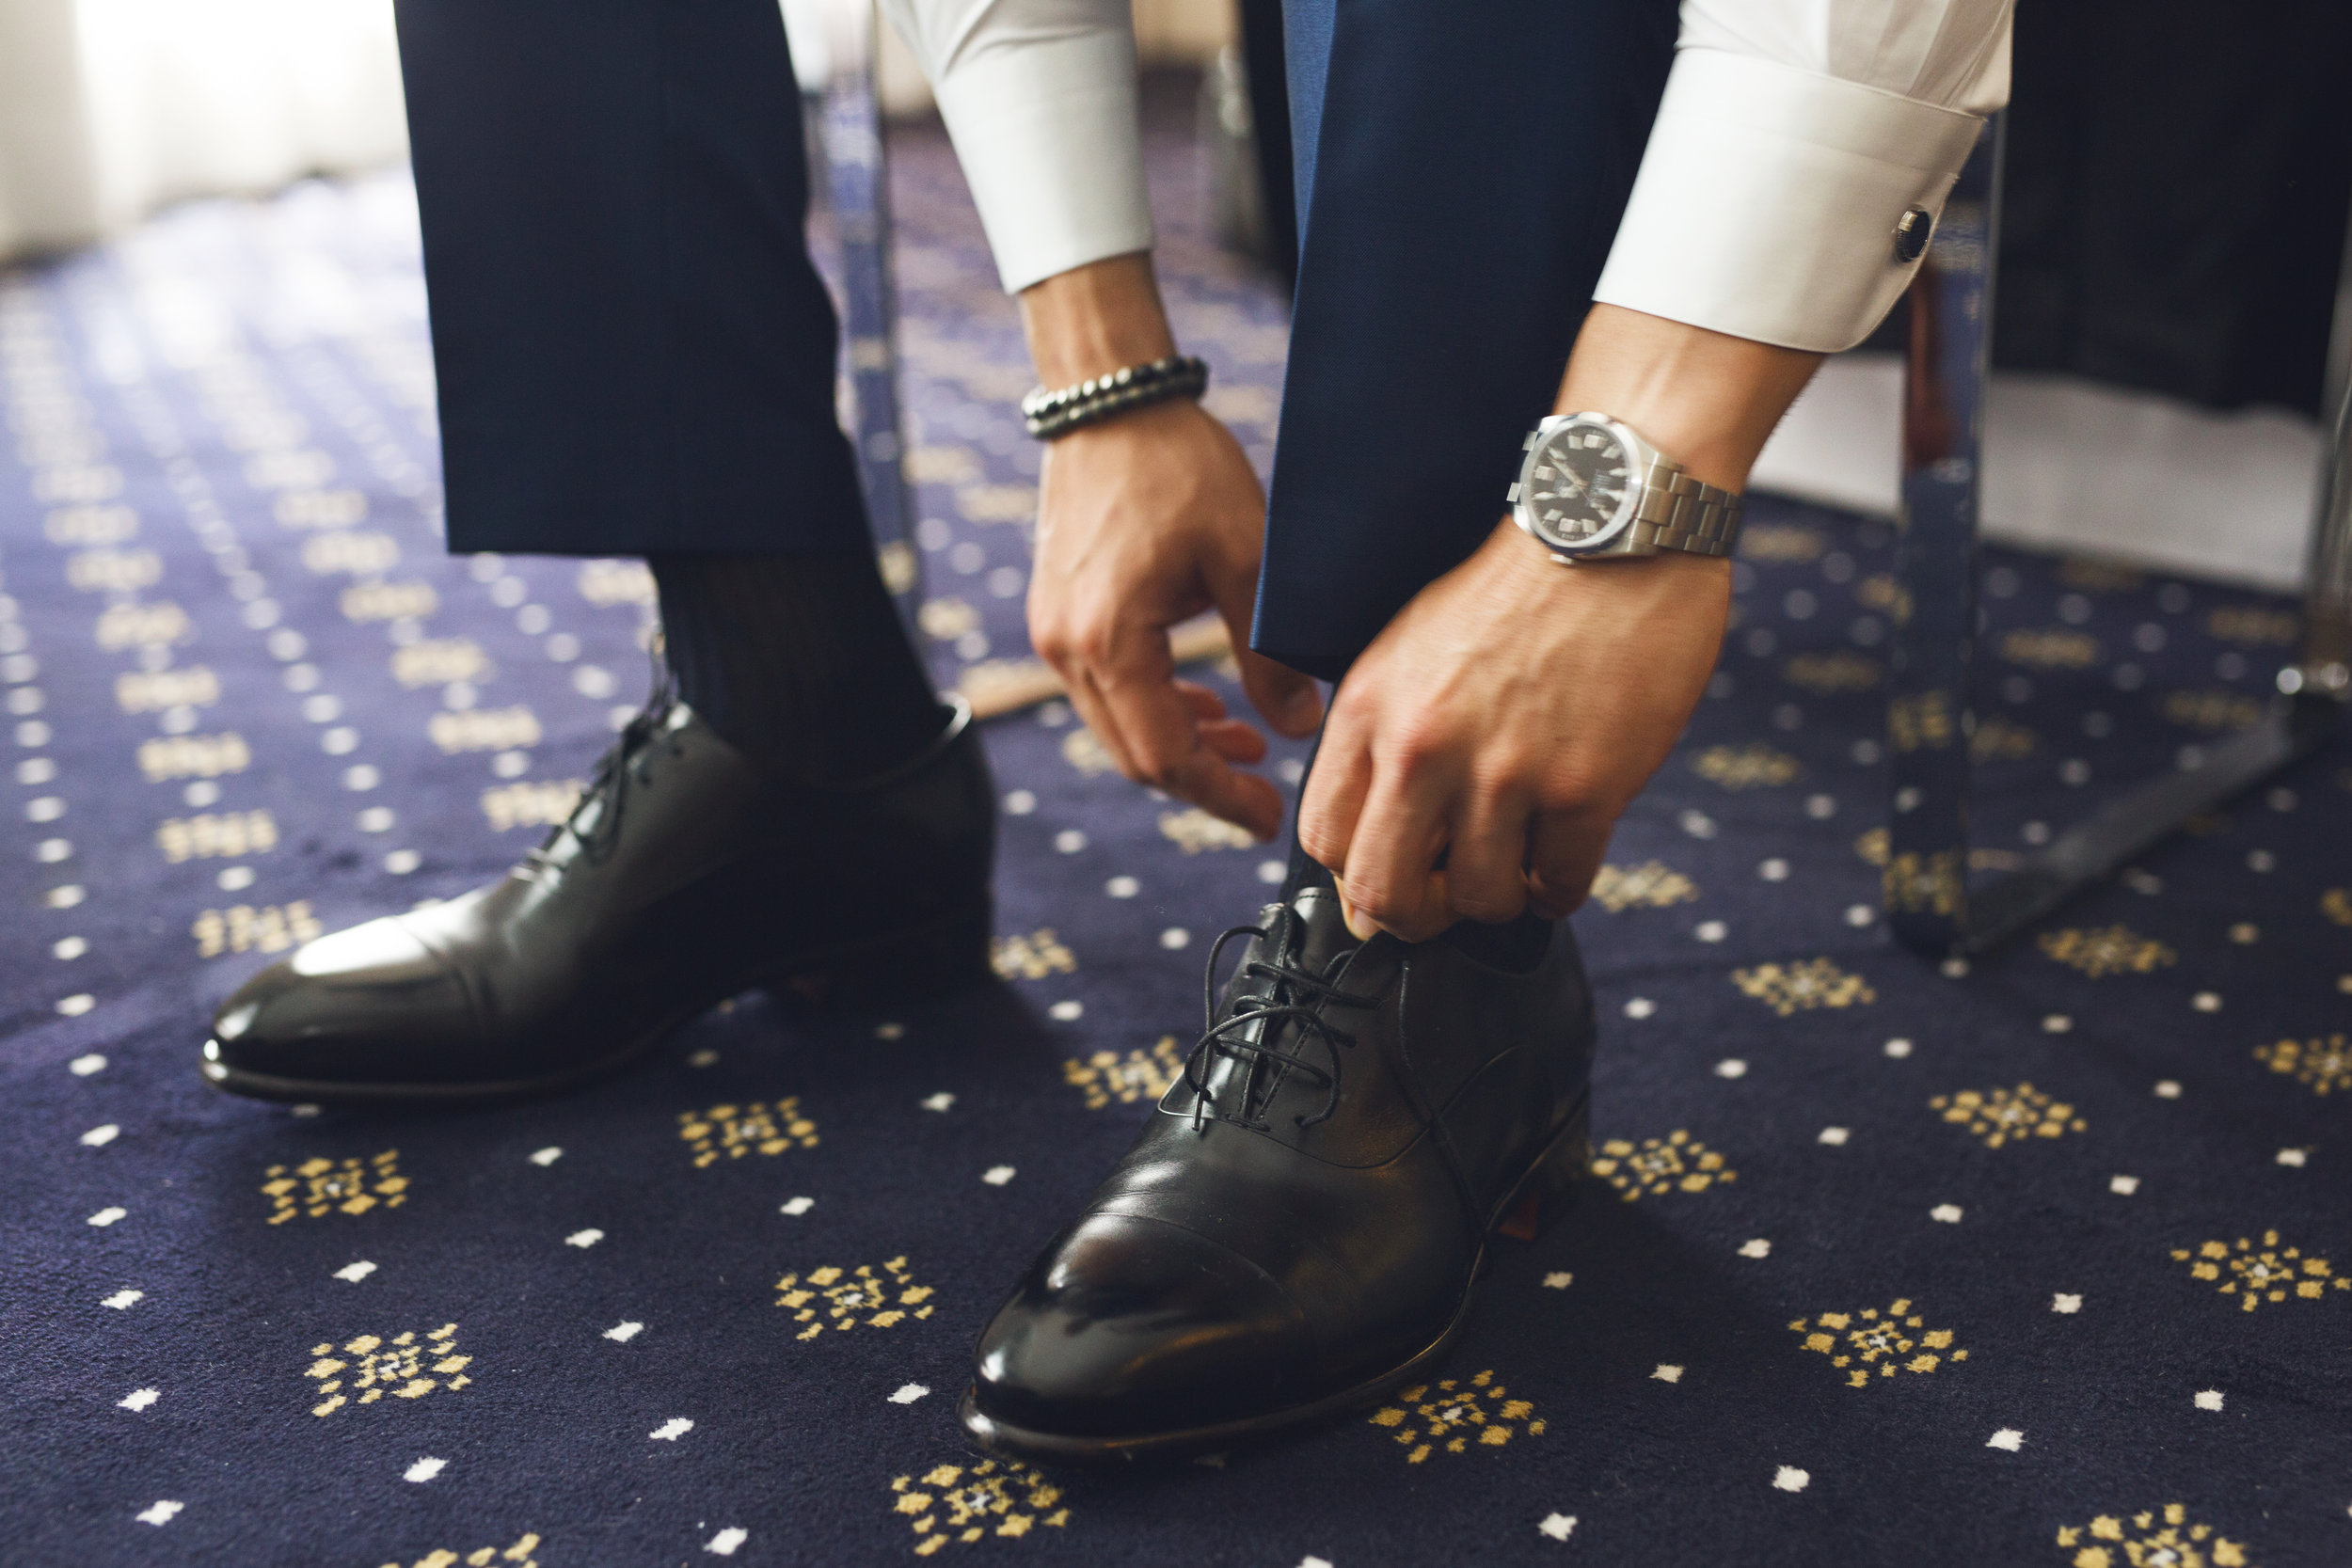 Getting ready for a Big Day. Bespoke trousers in VBC S120s fresco lana,  Gallo  socks,  Santoni  dress shoes.  Photo credit: @AlfonsoCalzaStudio